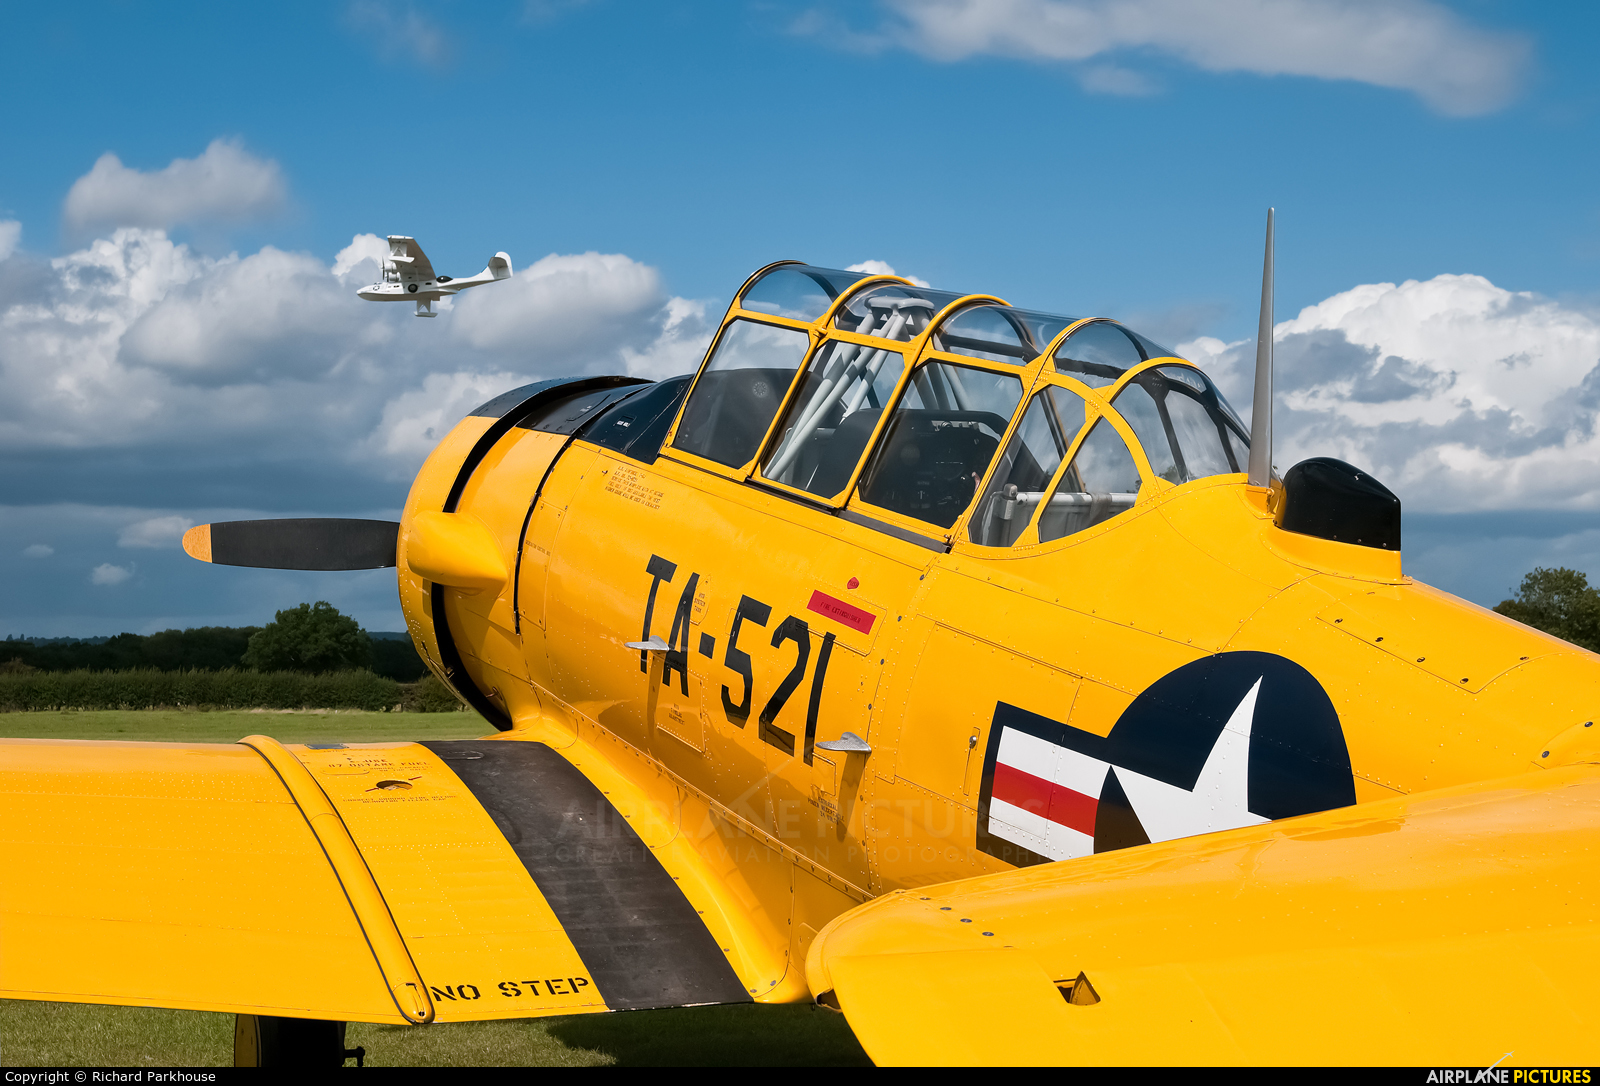 Private G-TVIJ aircraft at Lashenden / Headcorn